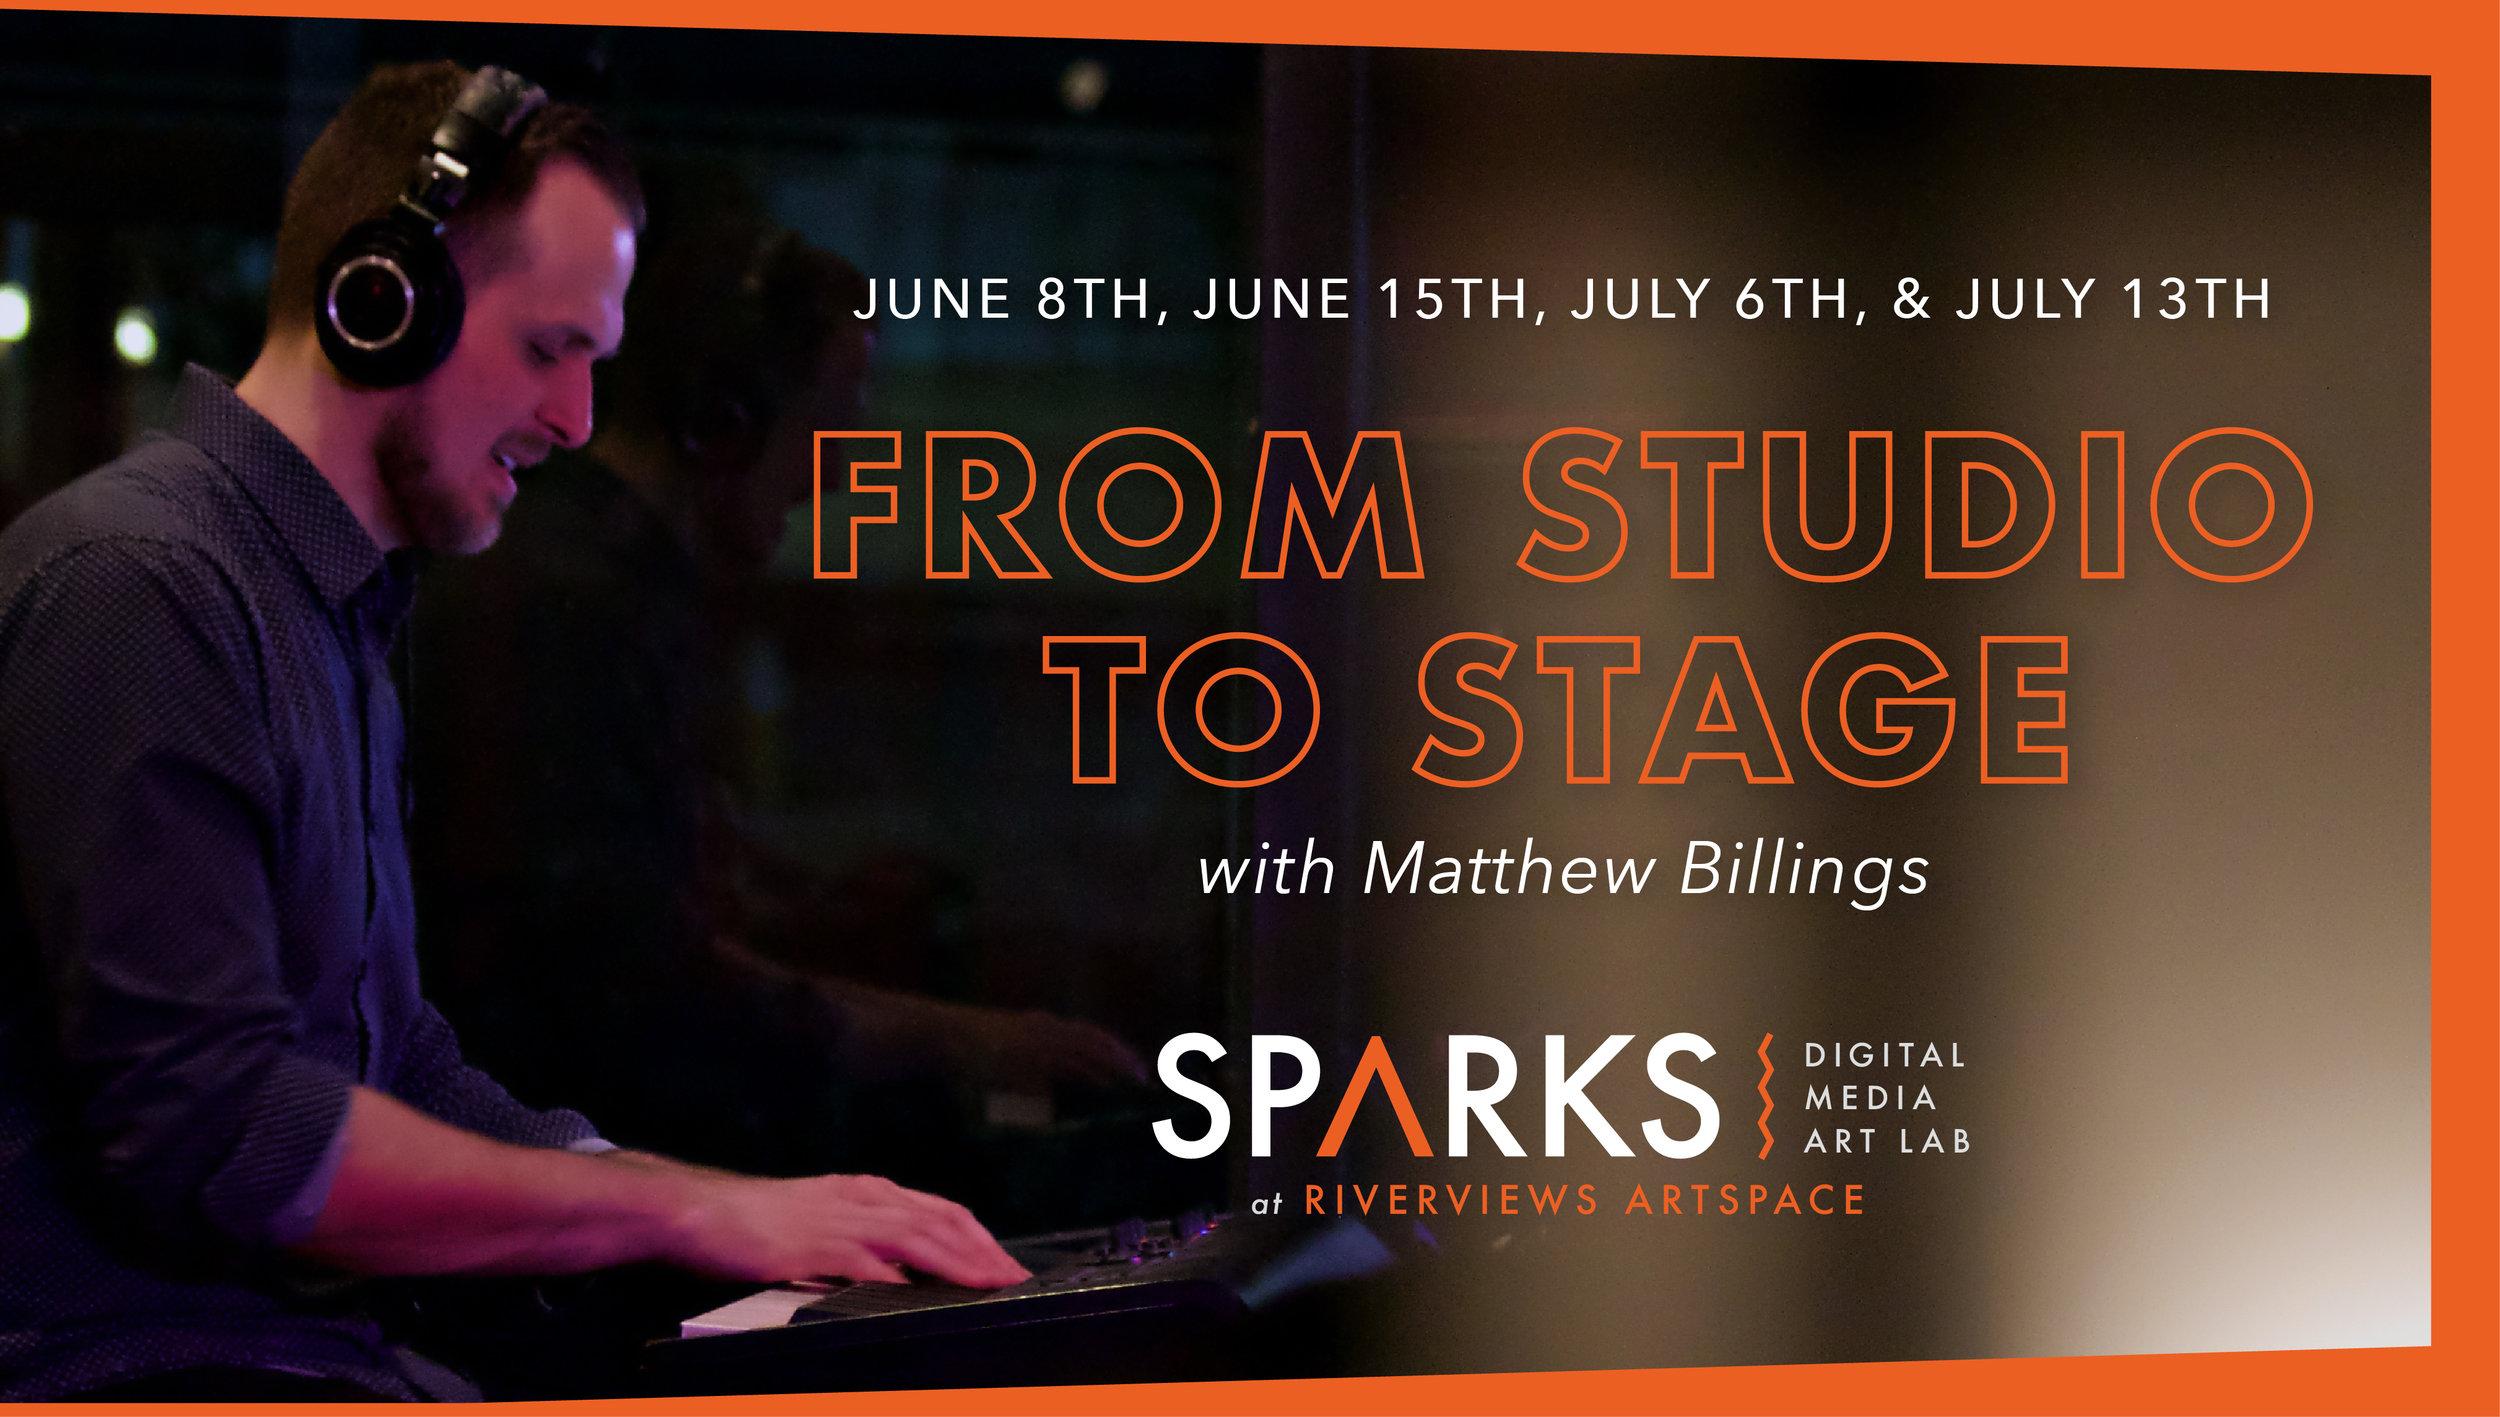 Sparks_Matthew_FB Image-01.jpg